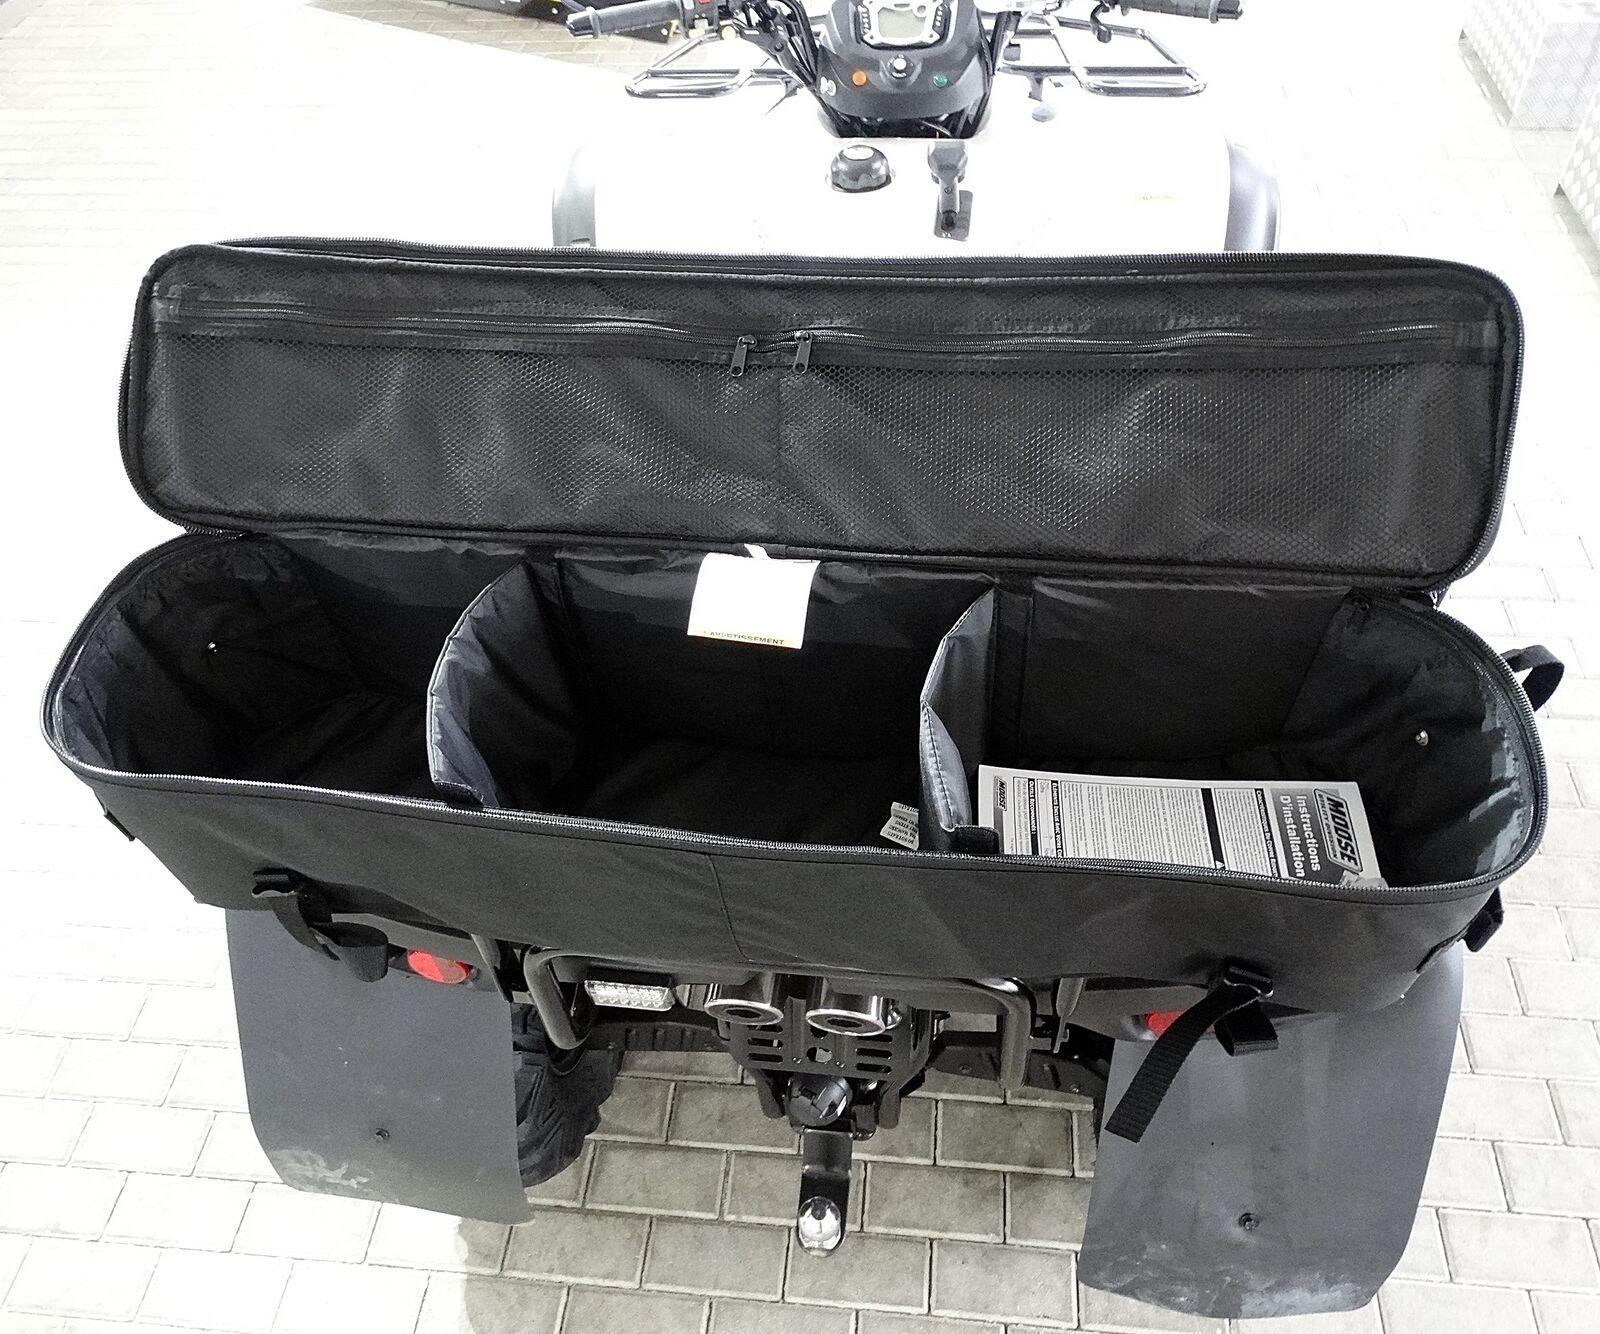 MOOSE RIDGETOP Bagages Sac arrière valise HONDA TRX 420 650 680 Rincon Rancher